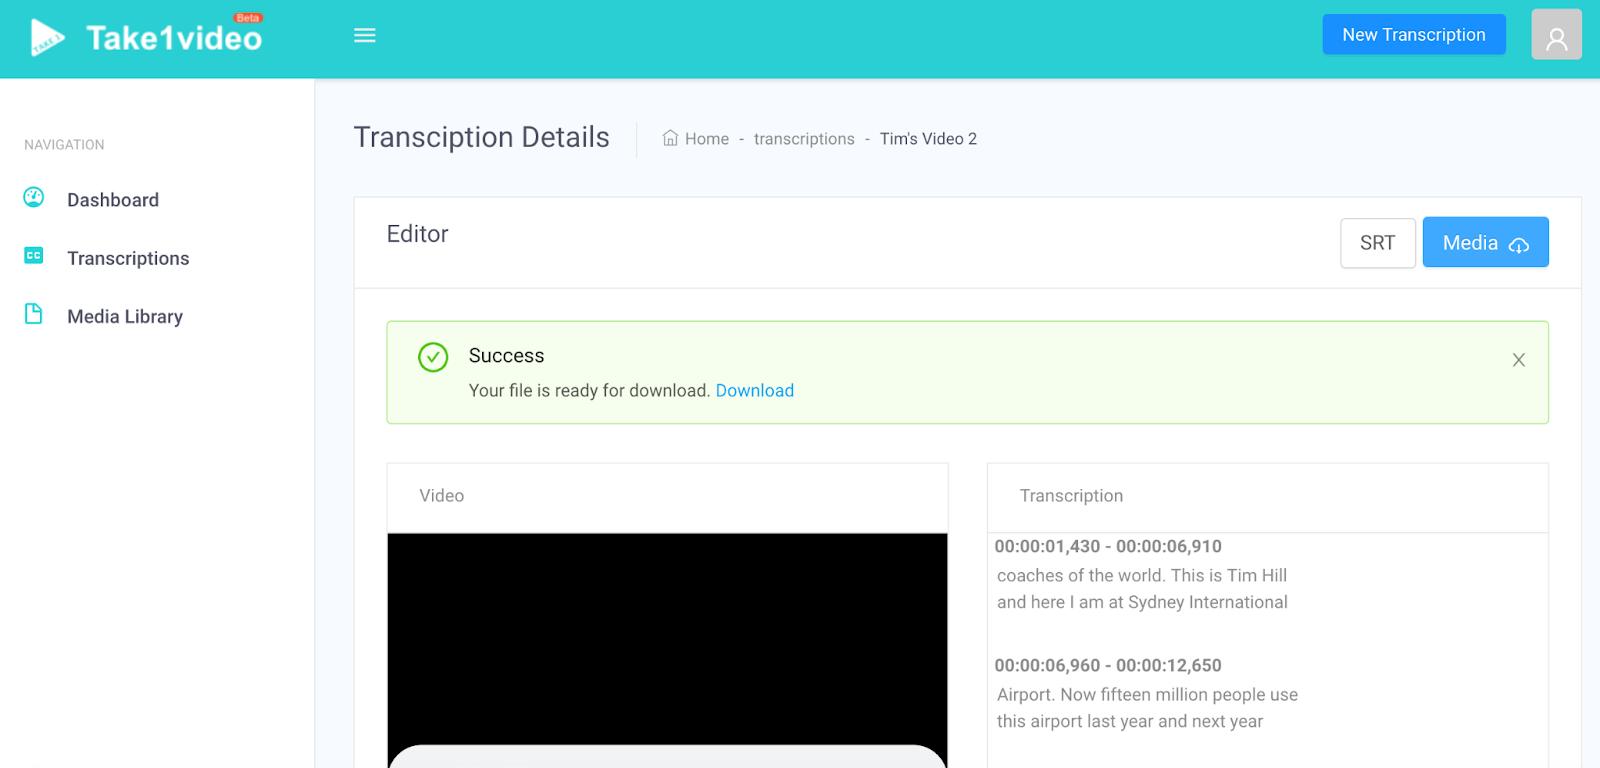 screenshot of take 1 video user interface of the editor